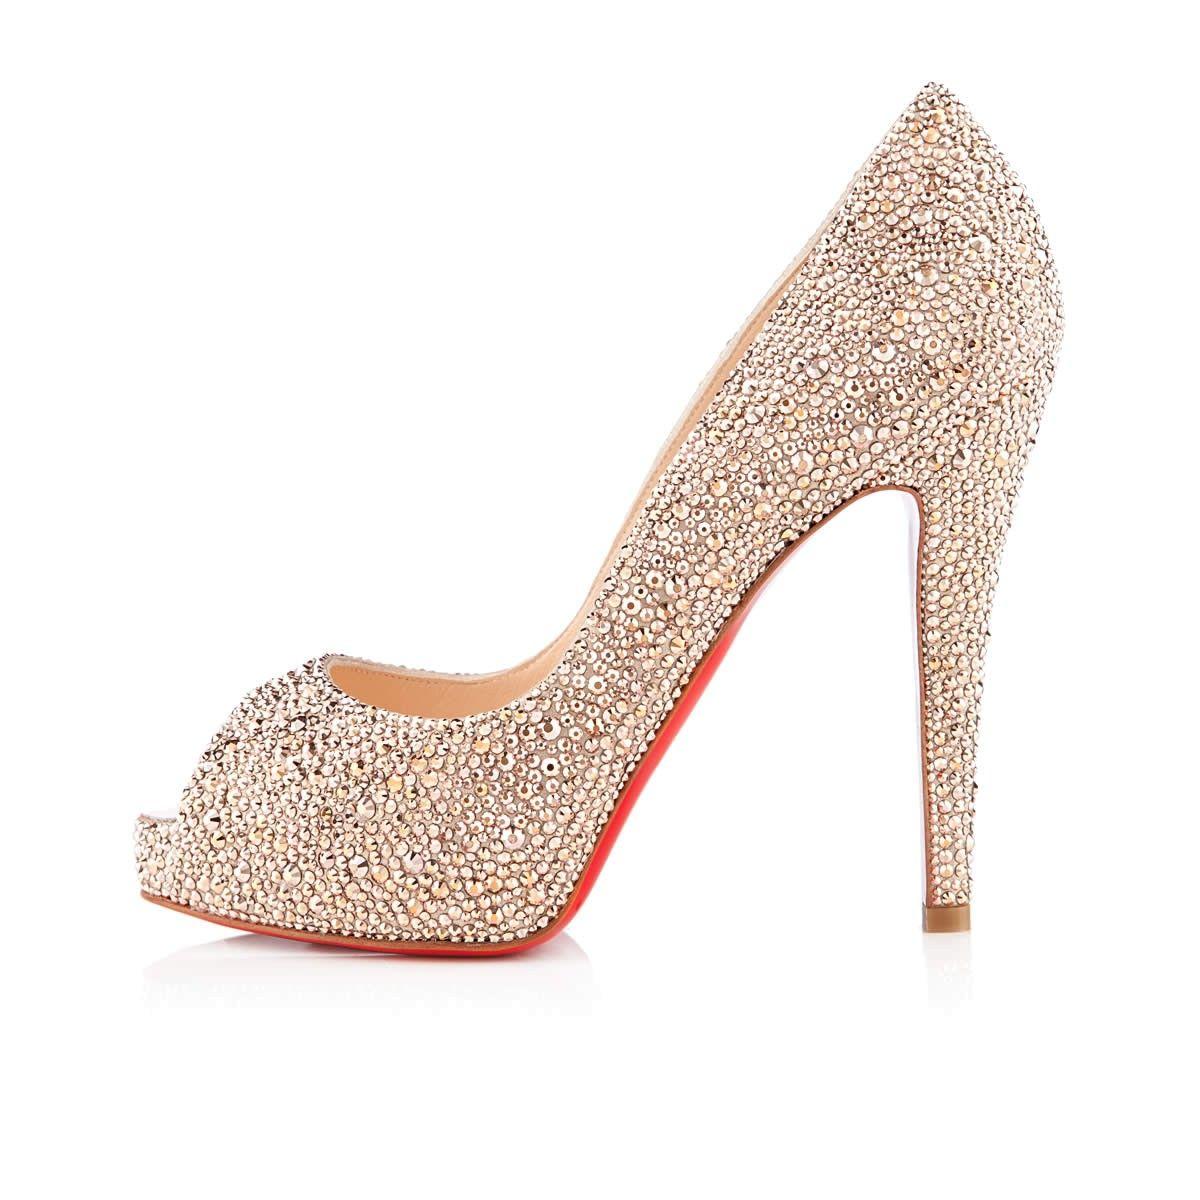 Sapato para debutante, prata e outros   Womens Fashion   Pinterest ... b5f388af6d